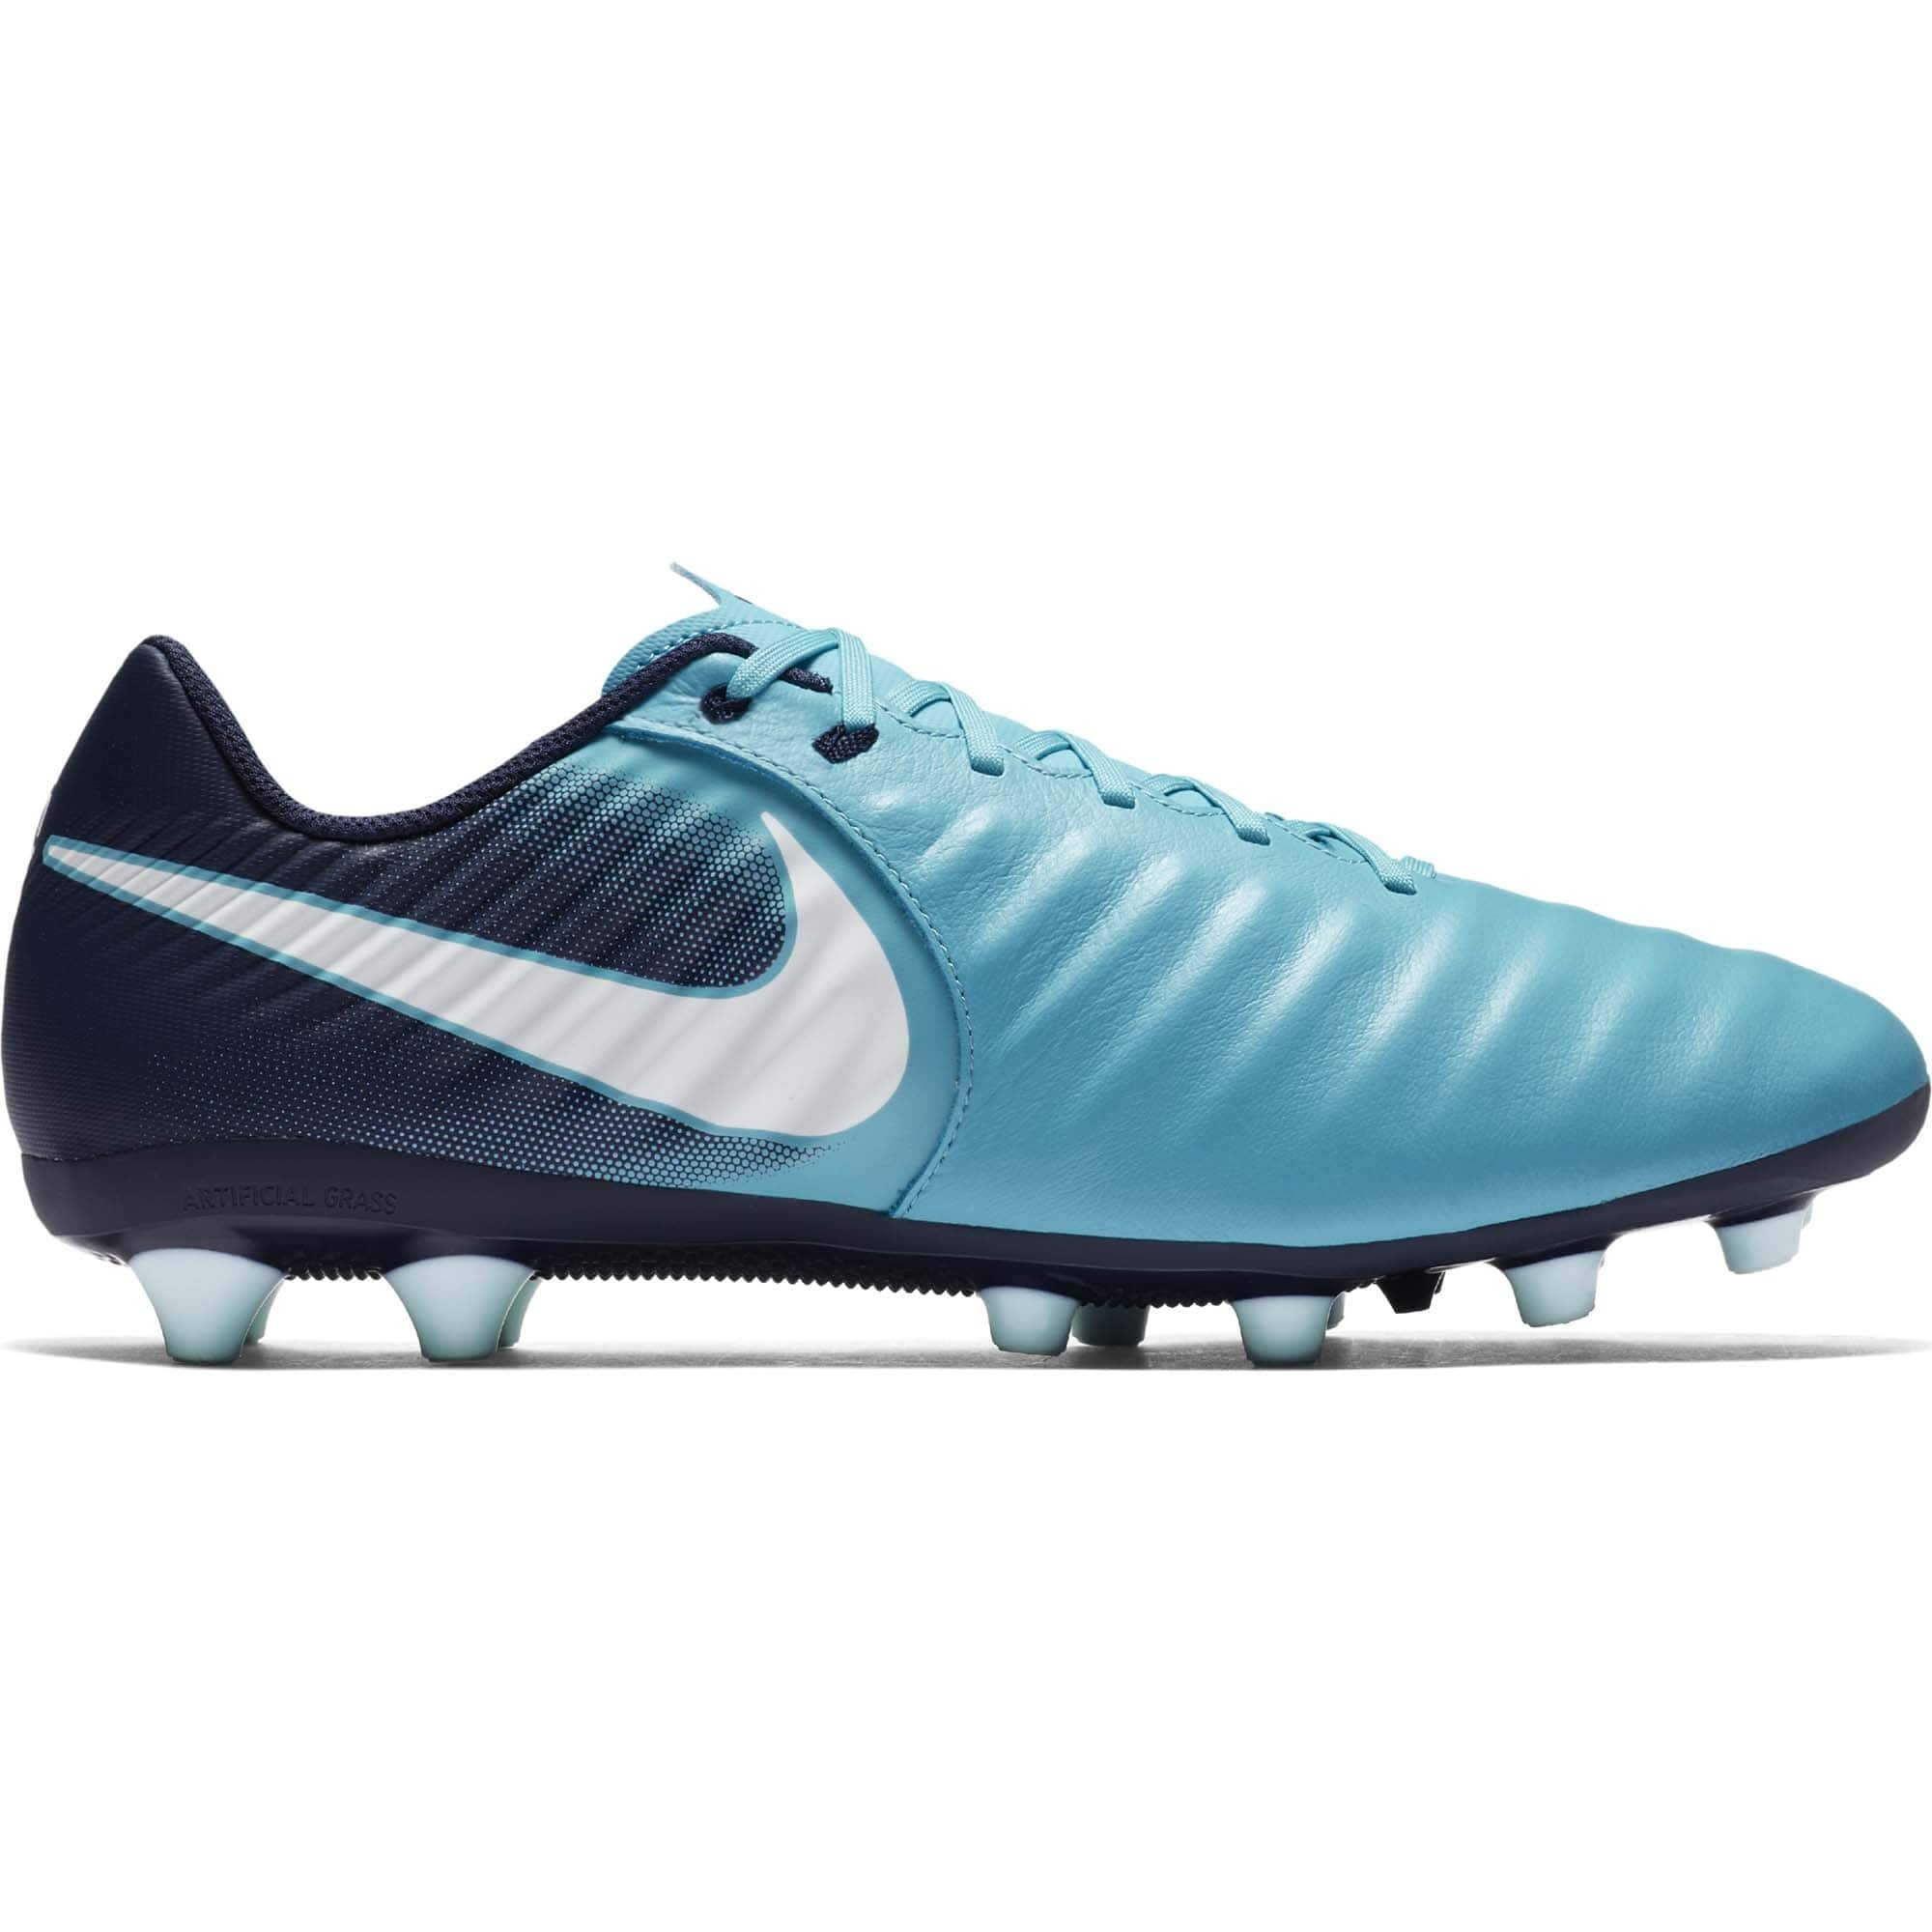 Tiempo Ag Liverpool Pro 414 Deportes Ligera 897743 Iv Nike wOm80vnN